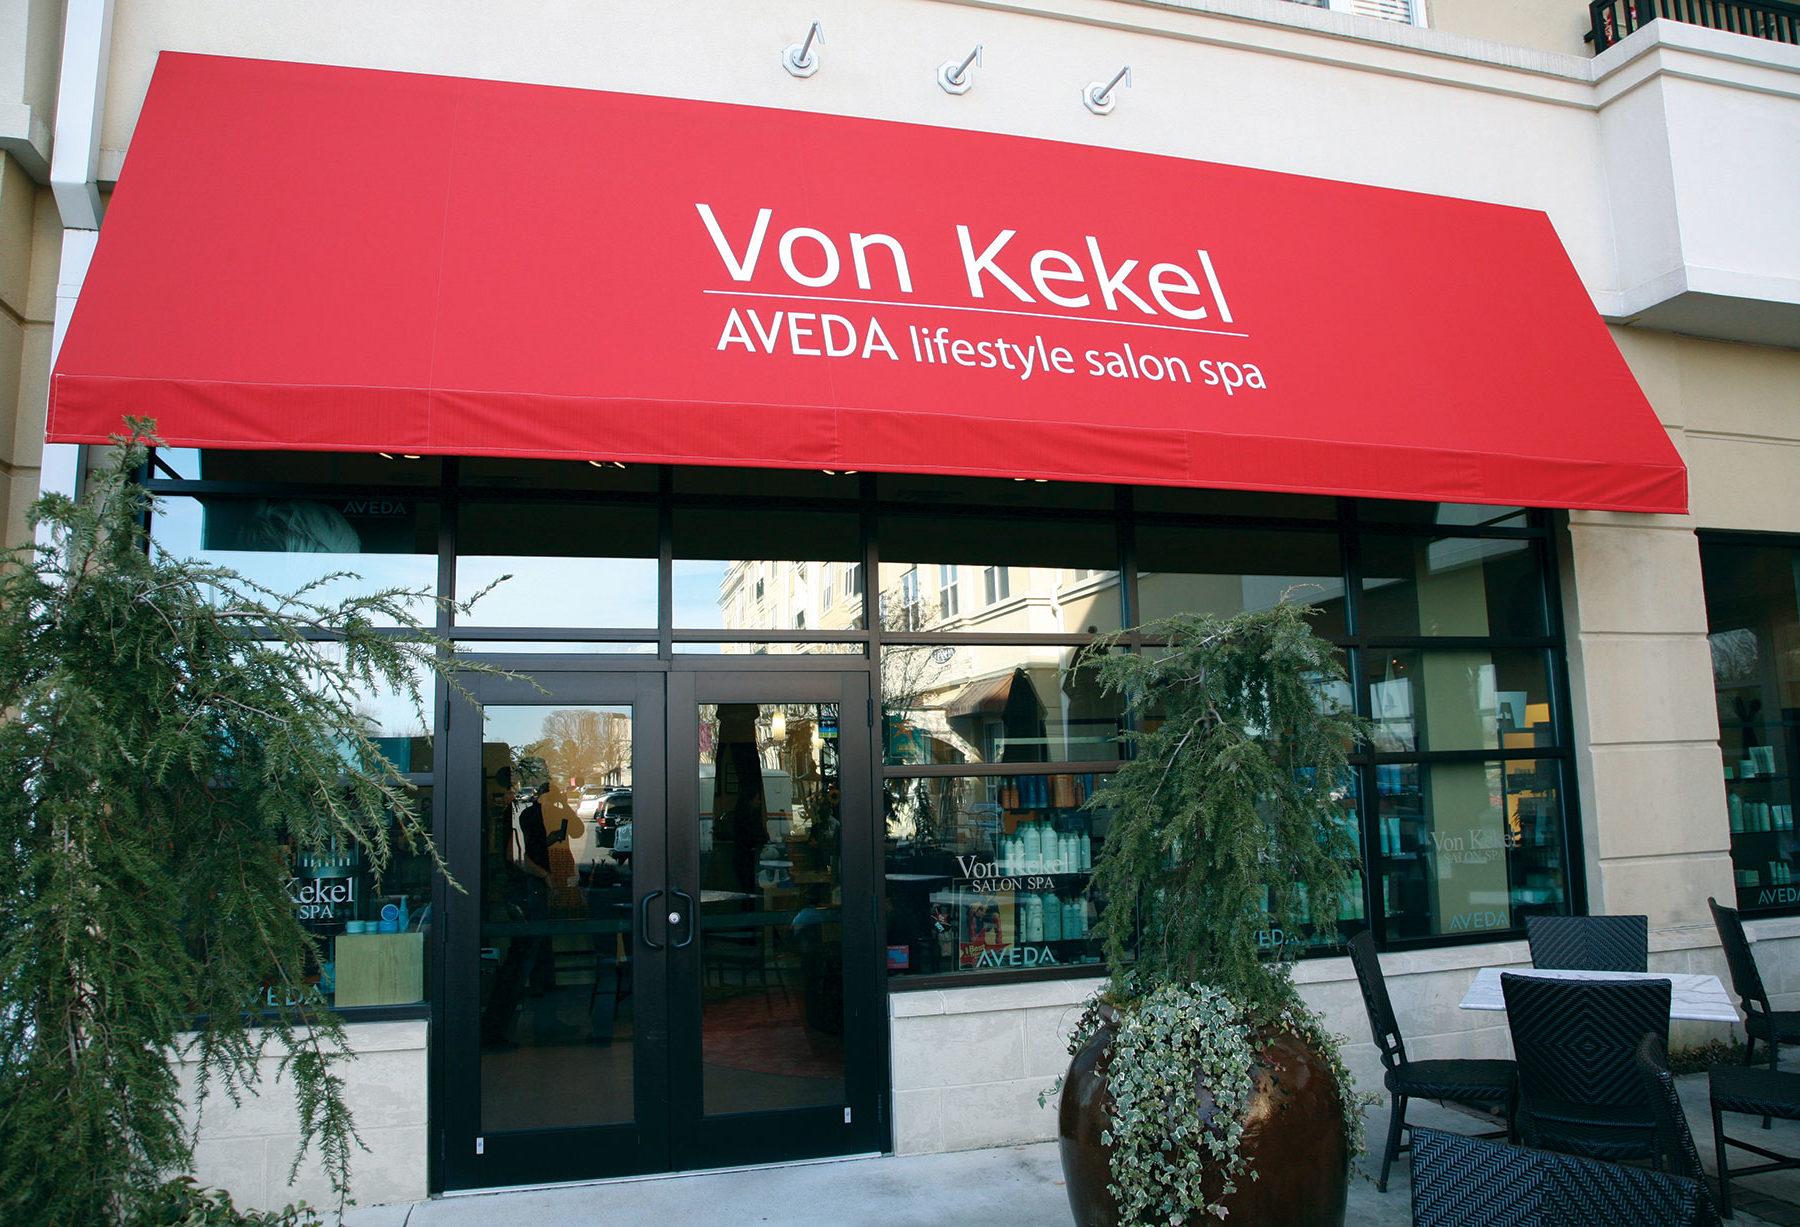 Von Kekel Aveda Lifestyle Salon Spa